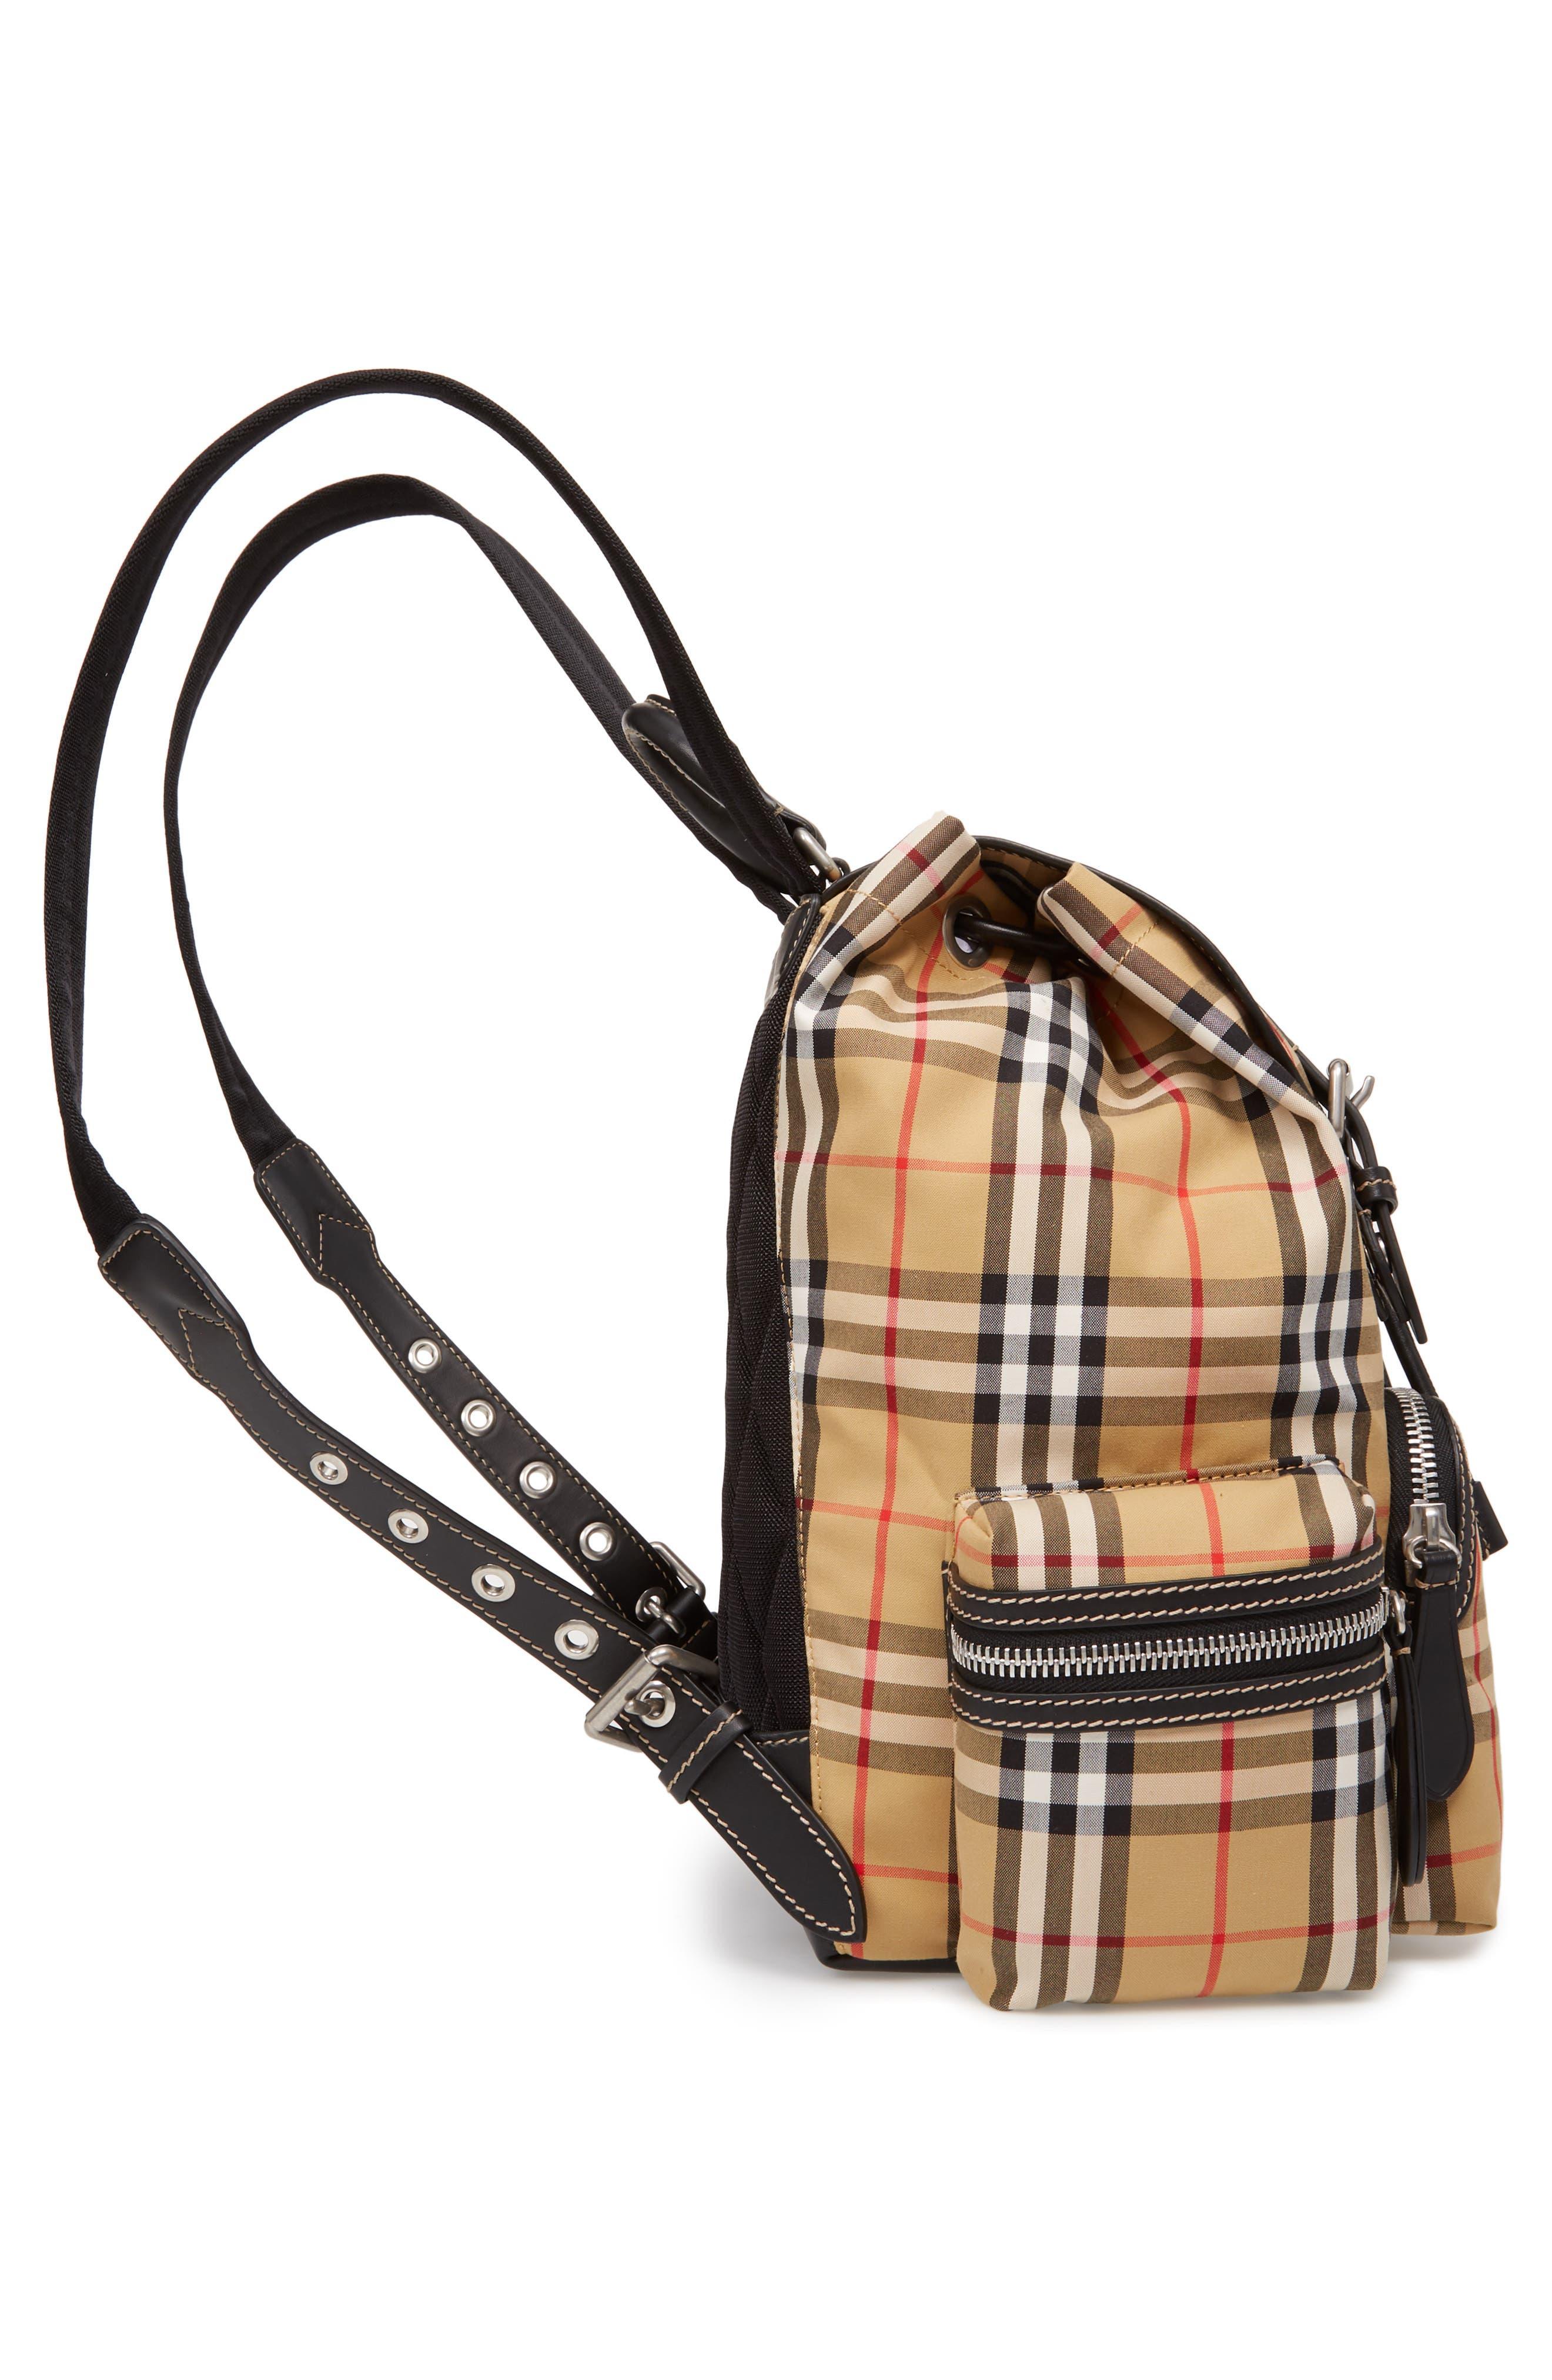 Medium Rucksack Check Cotton Backpack,                             Alternate thumbnail 5, color,                             ANTIQUE YELLOW